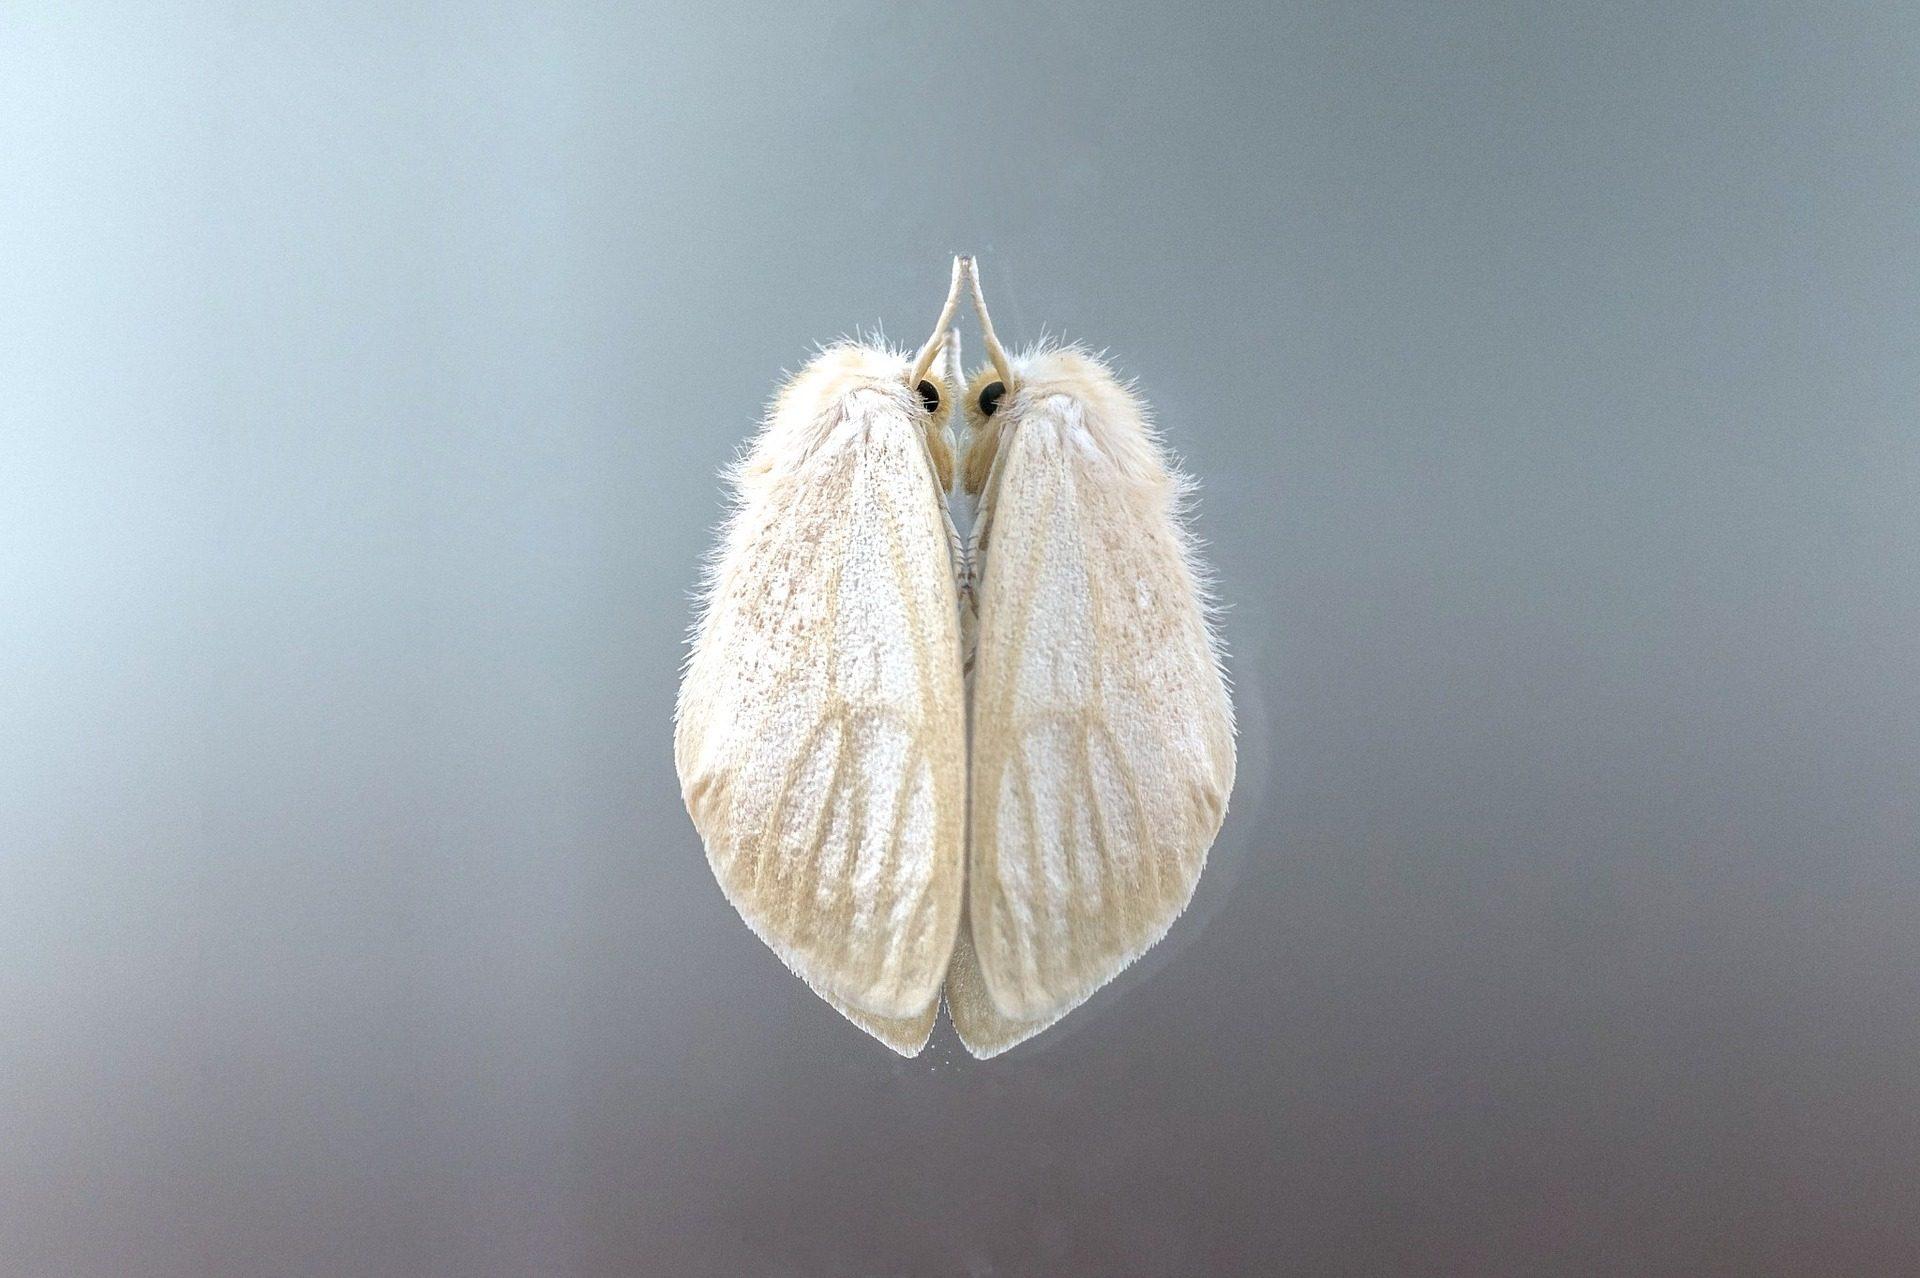 polilla, έντομο, φτερά, τρίχες, σκόνη, σχετικά με - Wallpapers HD - Professor-falken.com